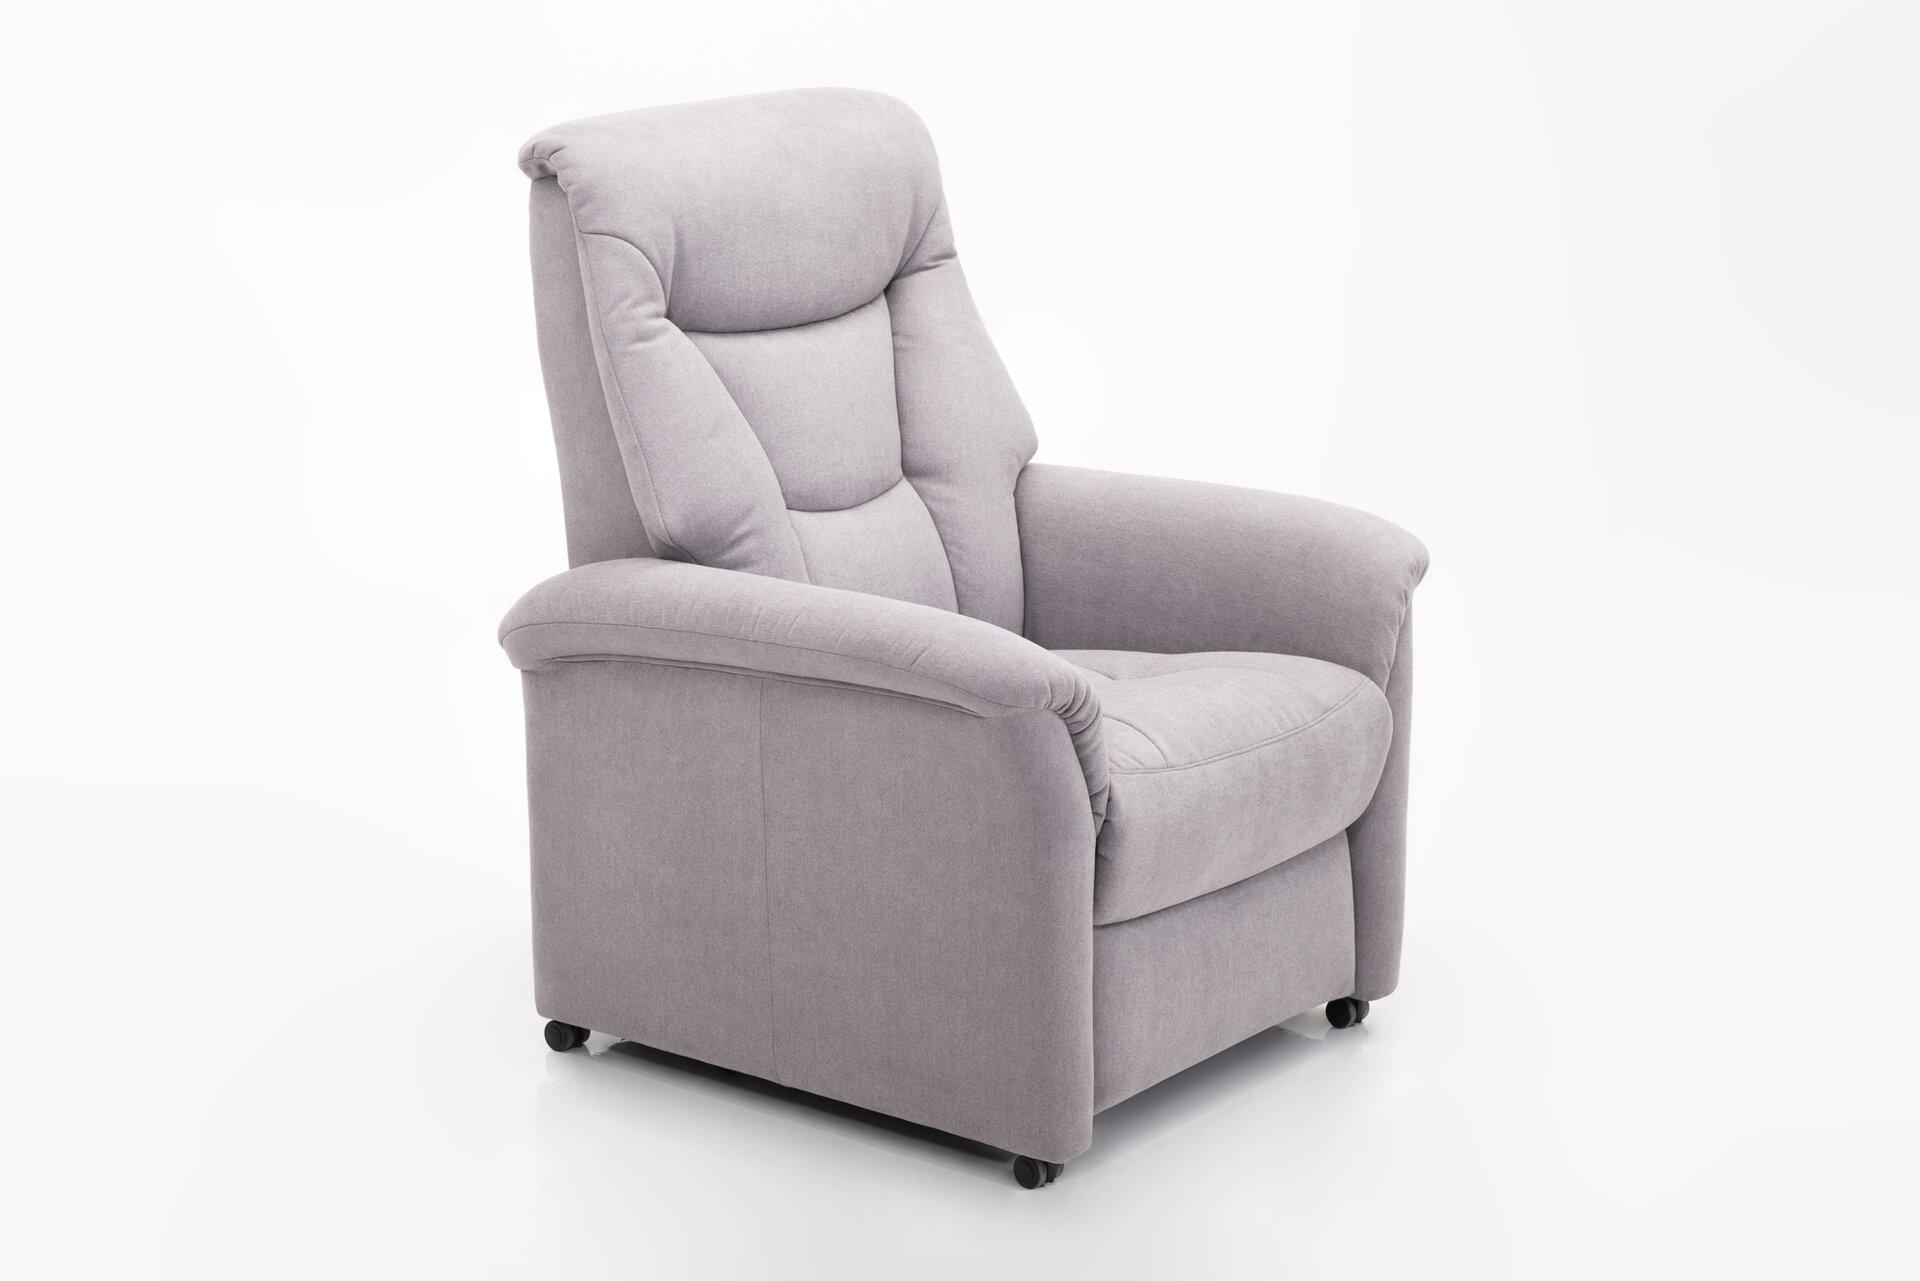 Einzelsessel KAYNE Vito Textil grau 84 x 109 x 84 cm